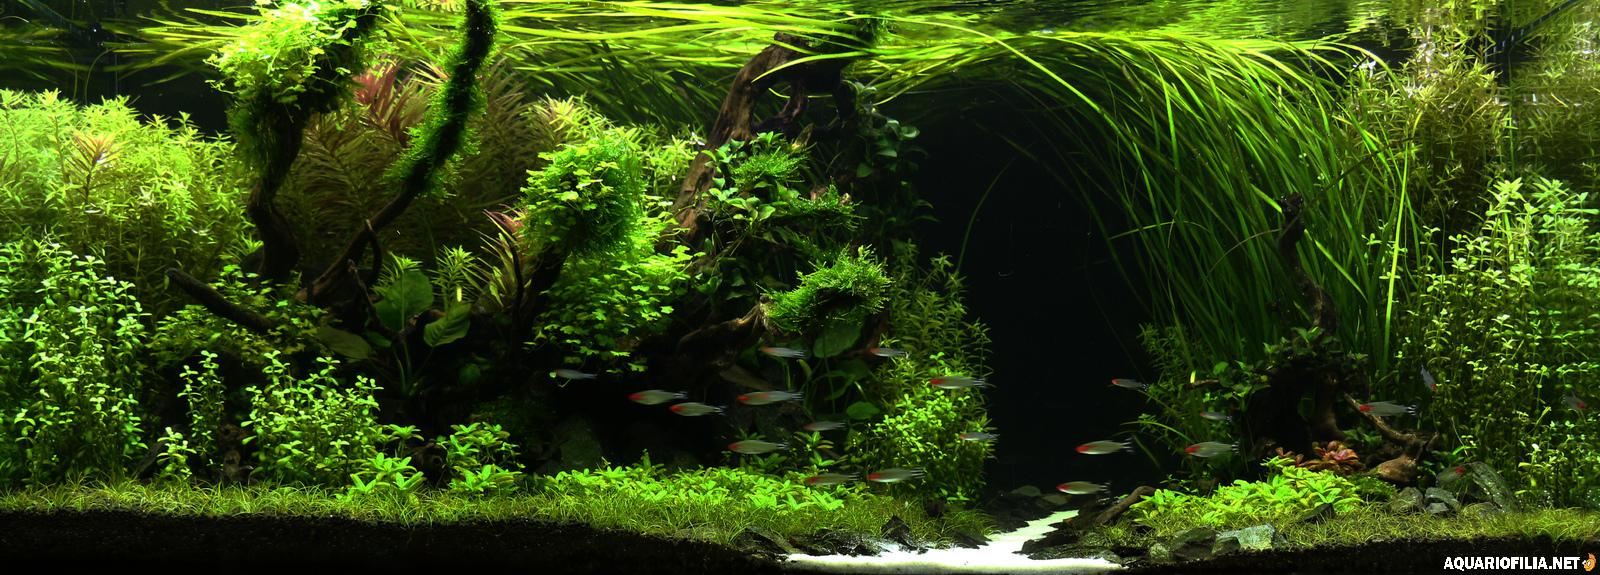 large.Rainforest.jpg